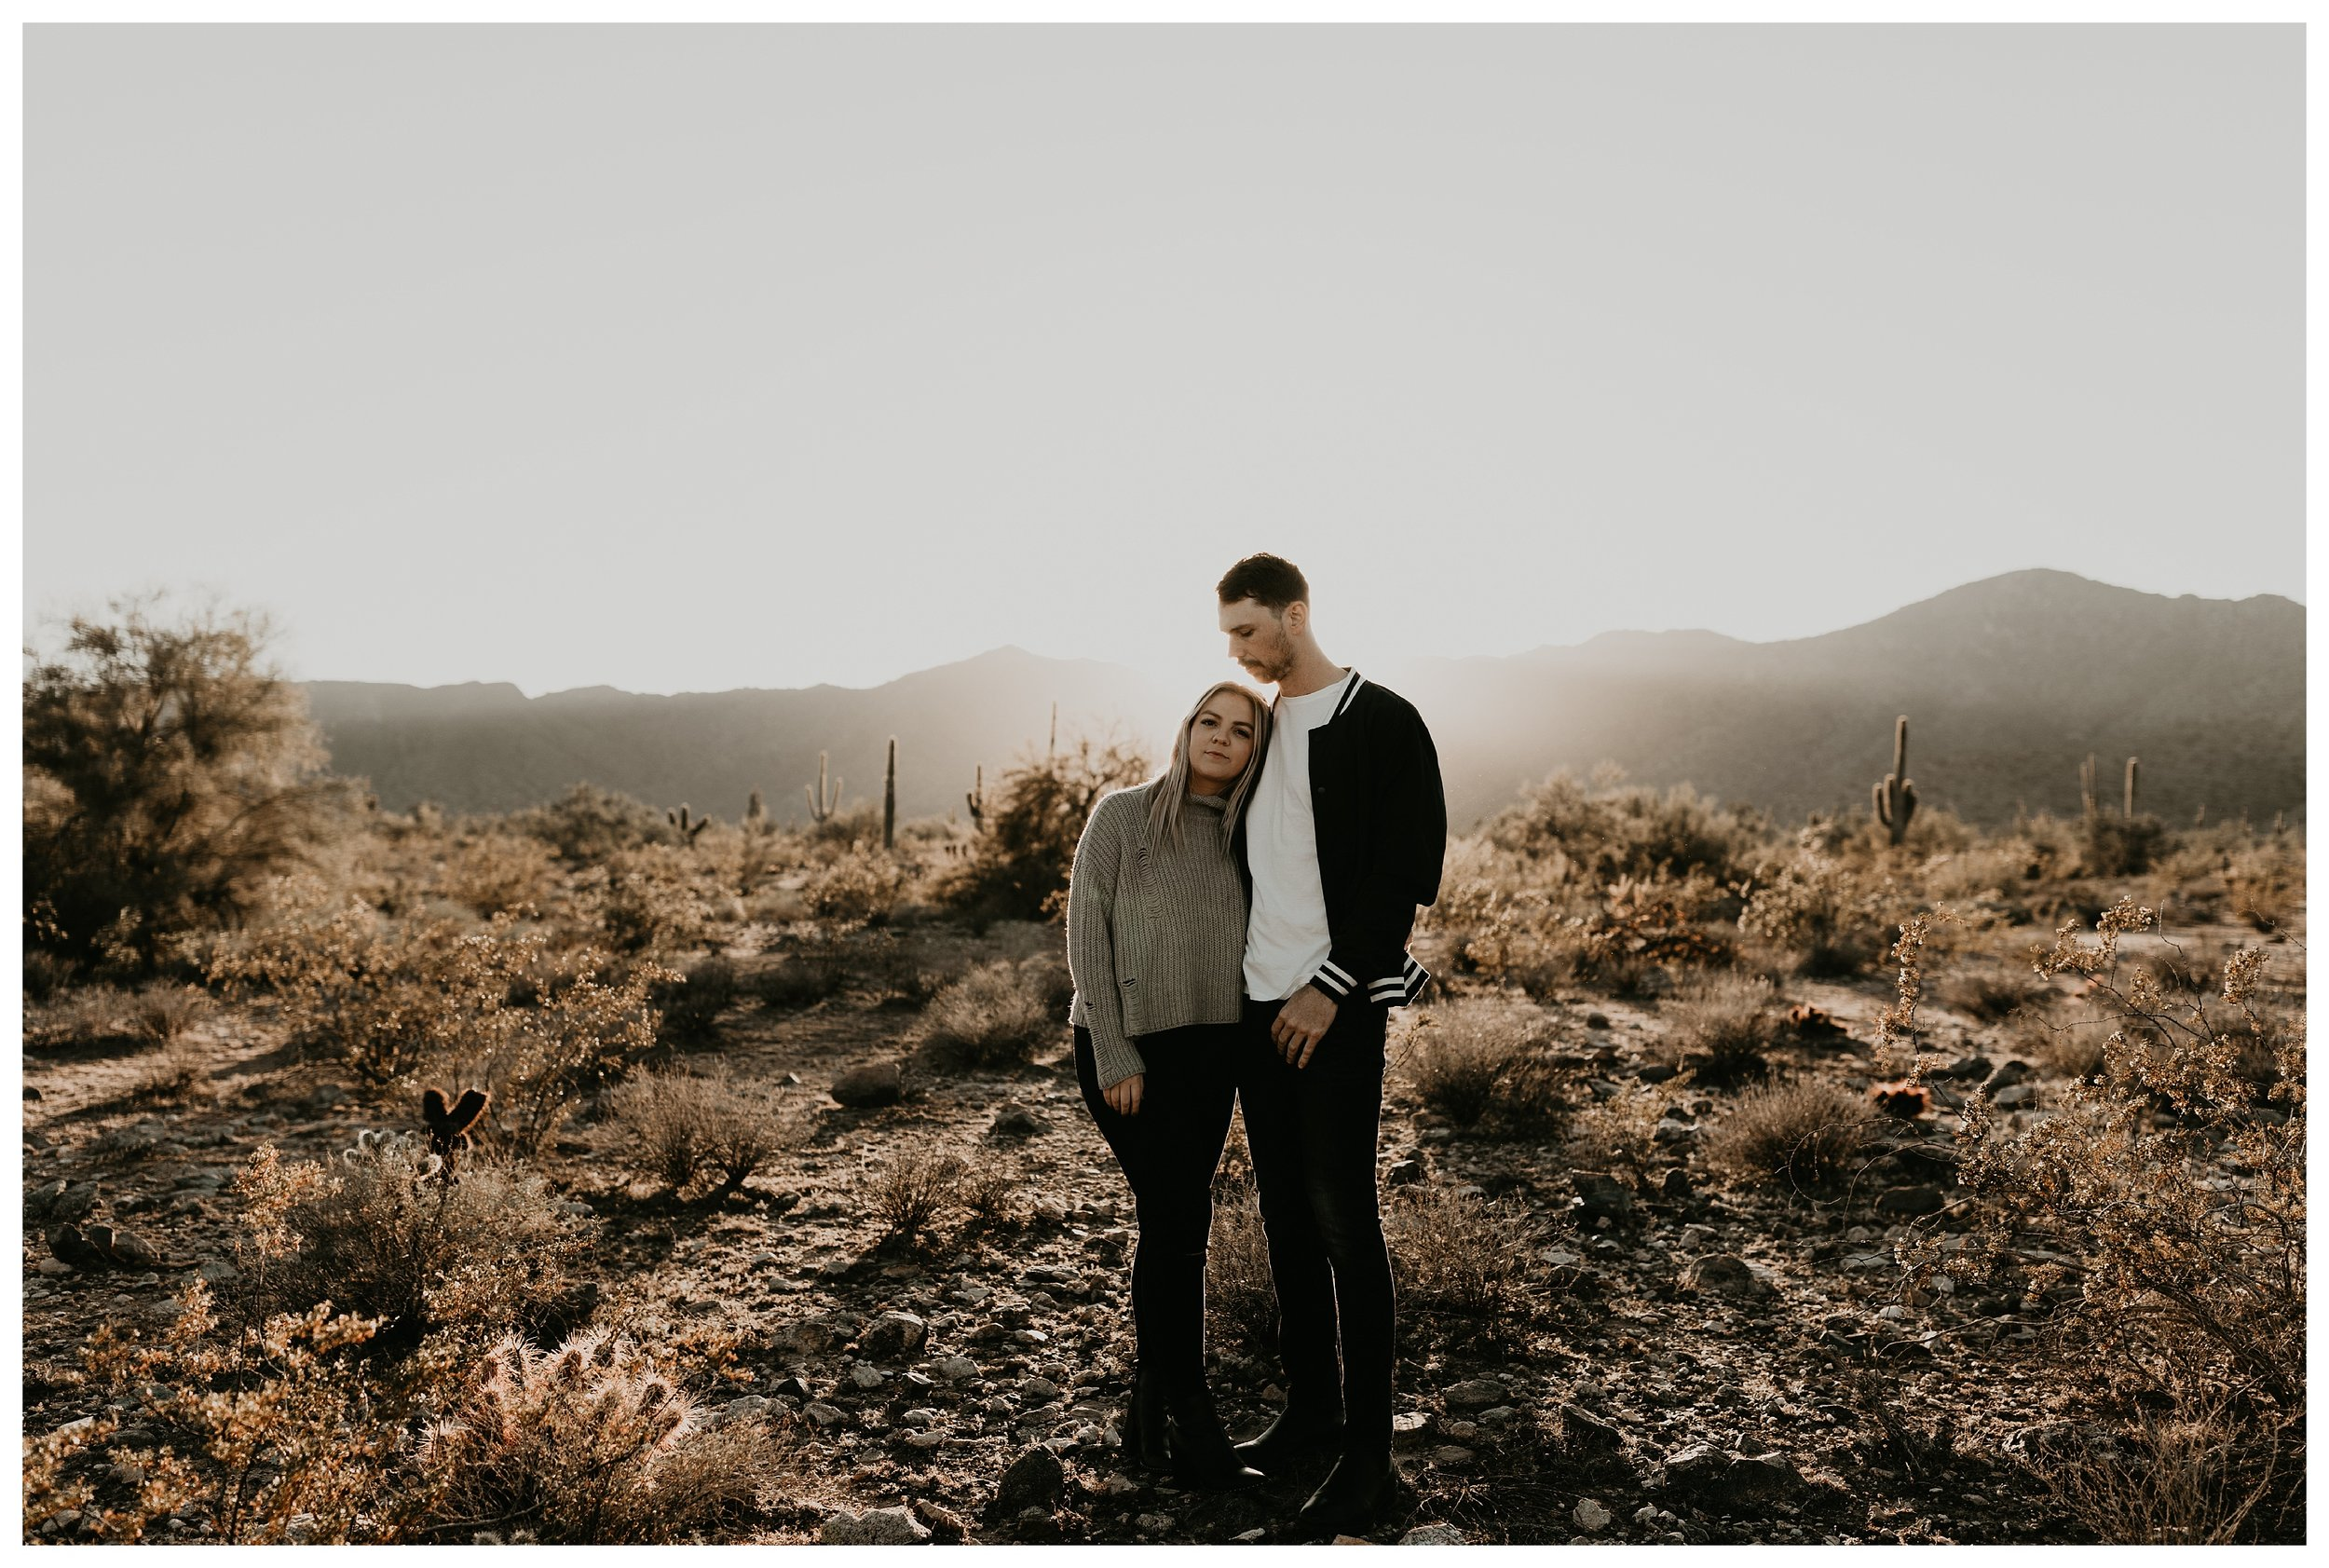 Engagement photo in Arizona at White Tank Mountain